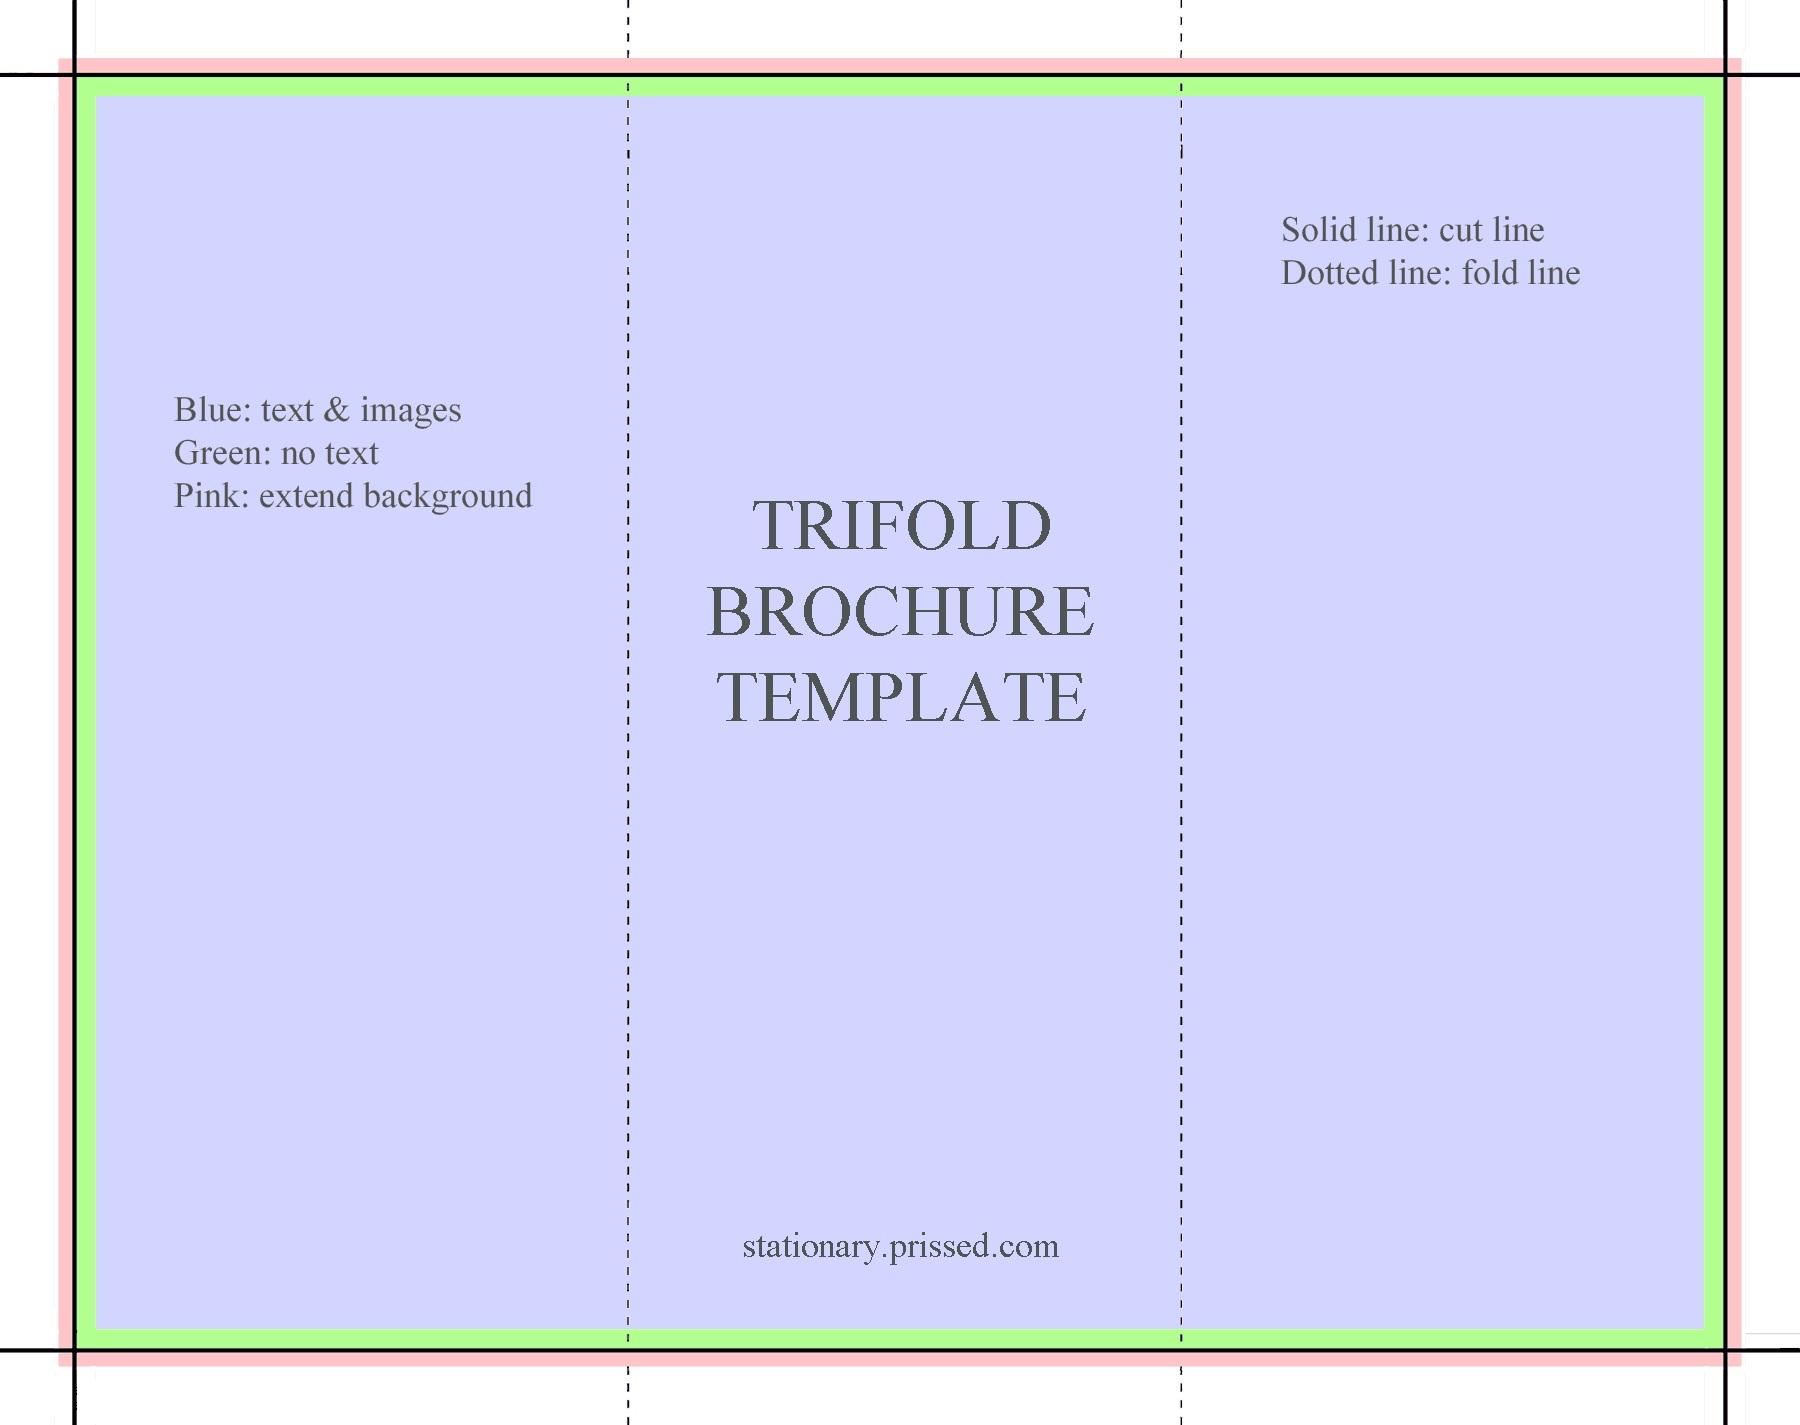 001 Unbelievable Free Online Brochure Template High Def  Templates Download Microsoft Word Real EstateFull